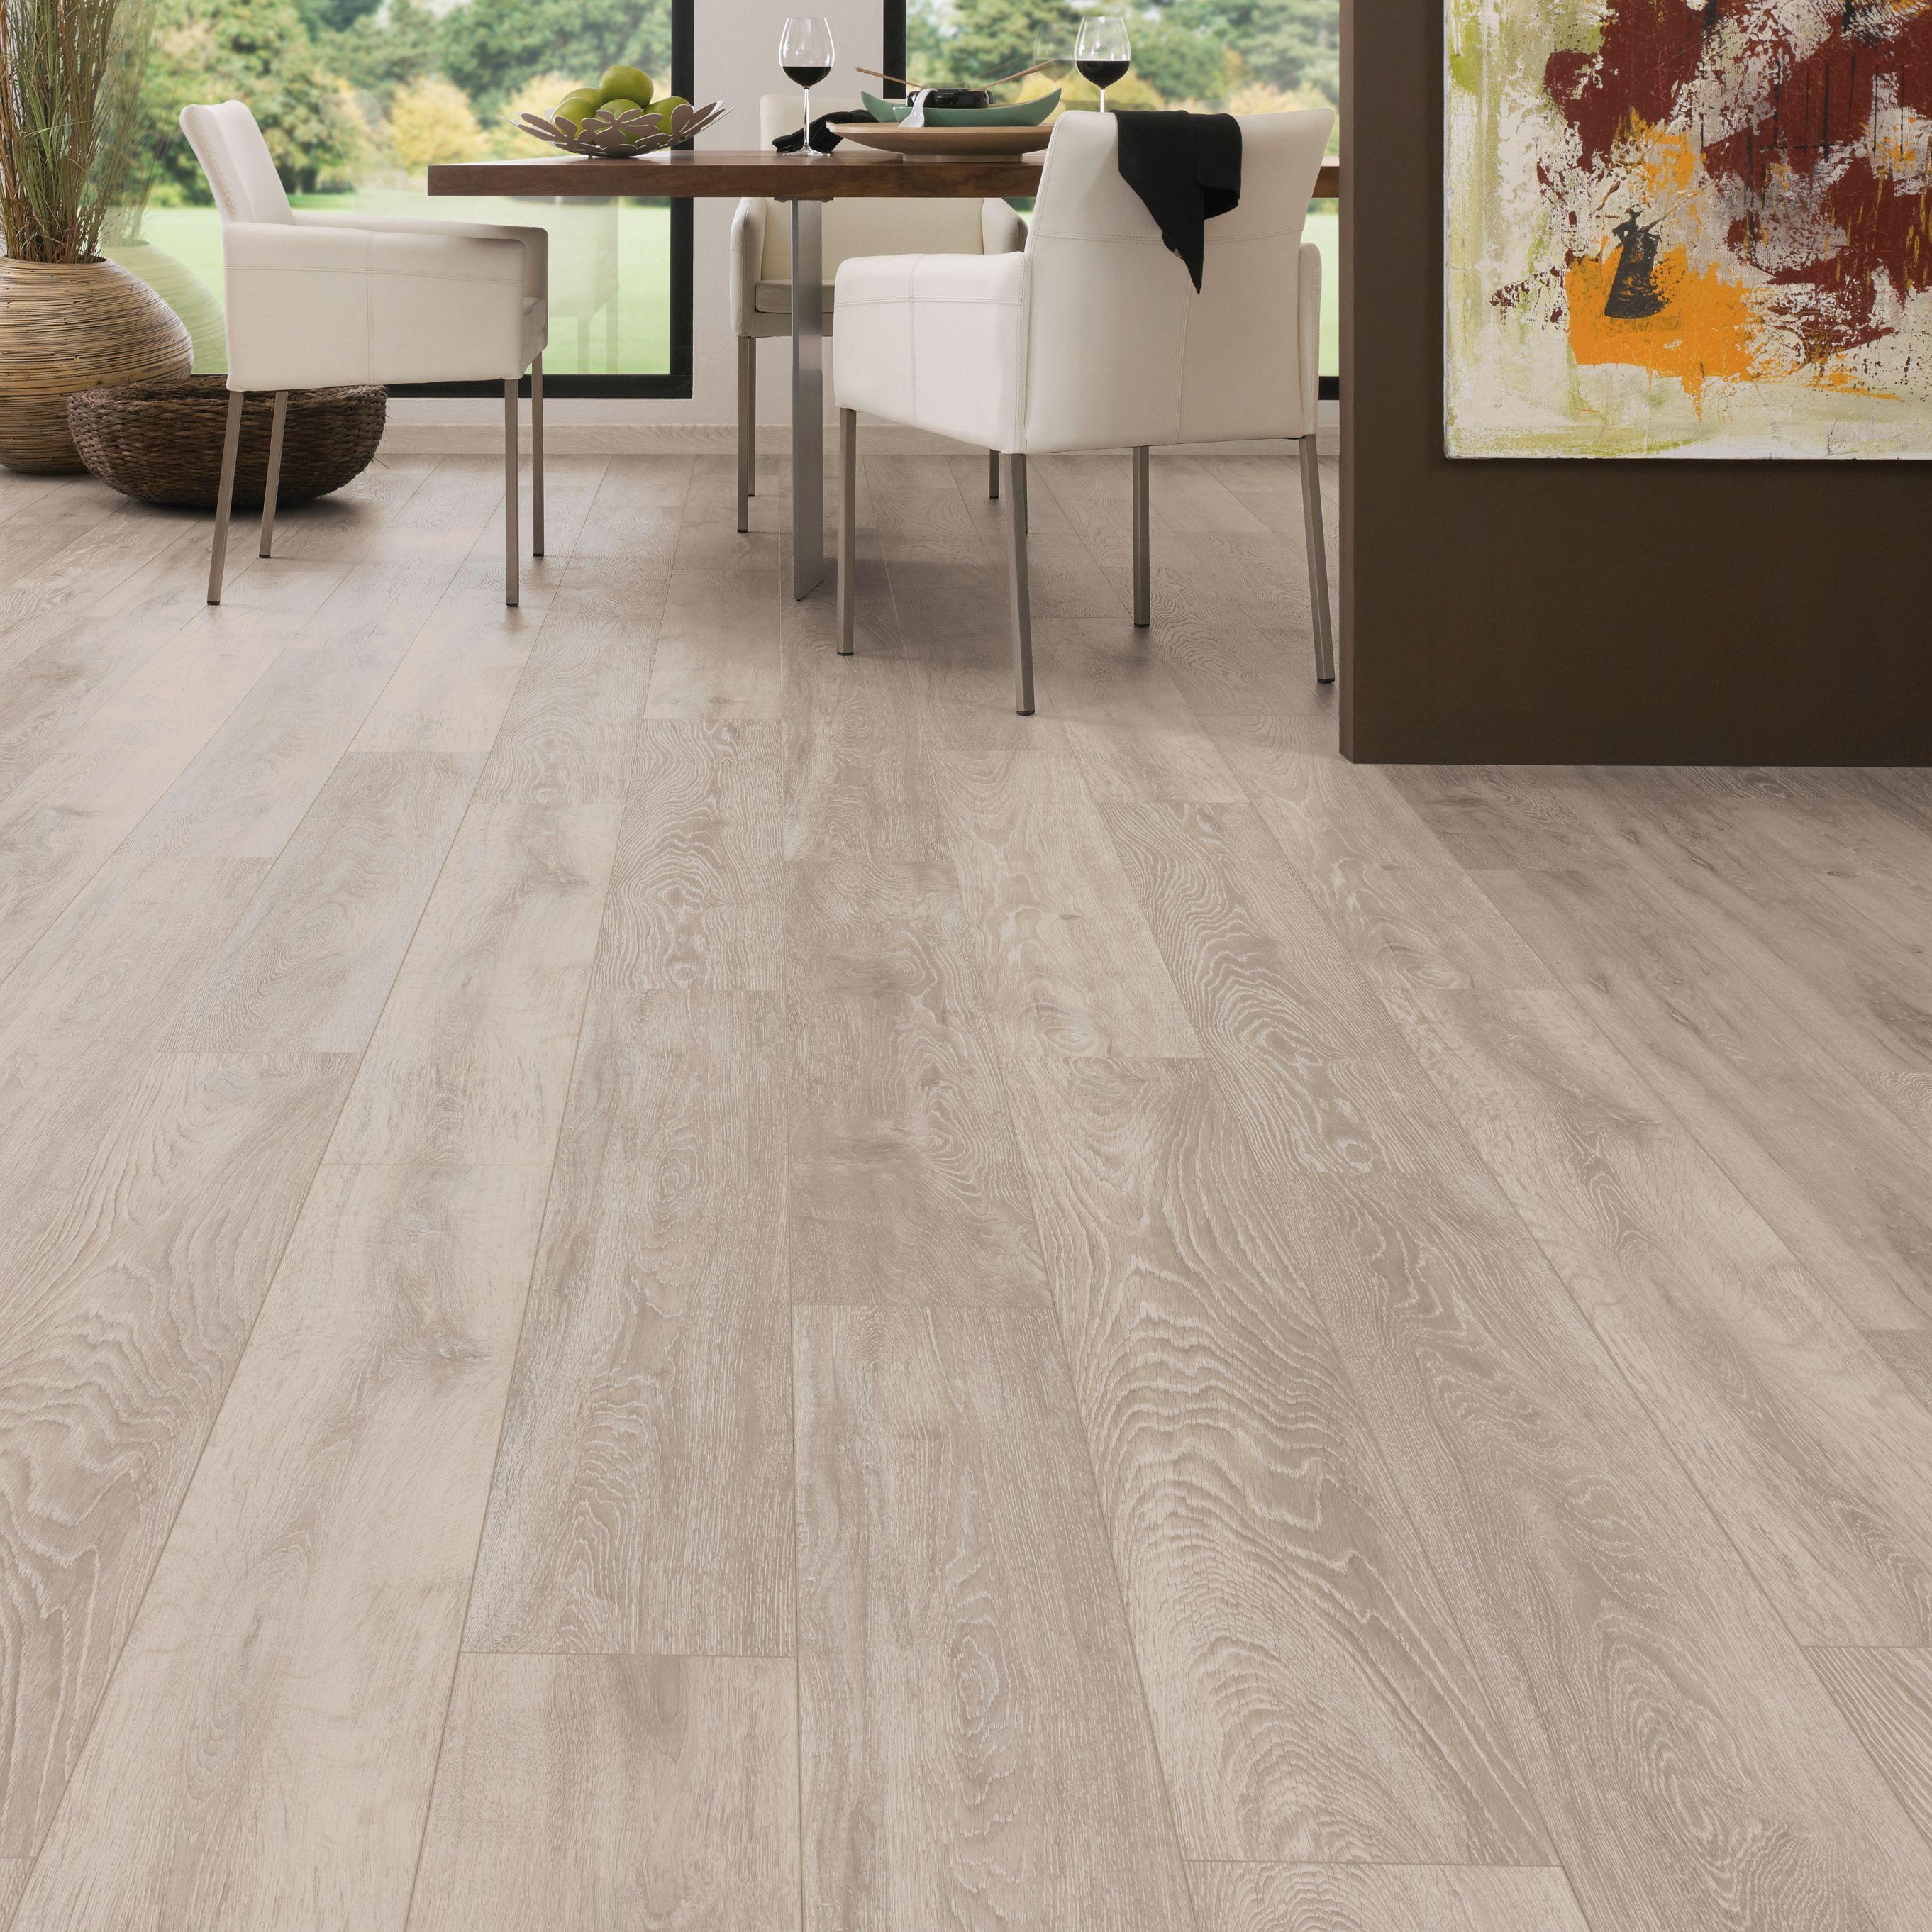 Amadeo Boulder Oak Effect Authentic Embossed Finish Laminate Flooring 2 22 M² Pack